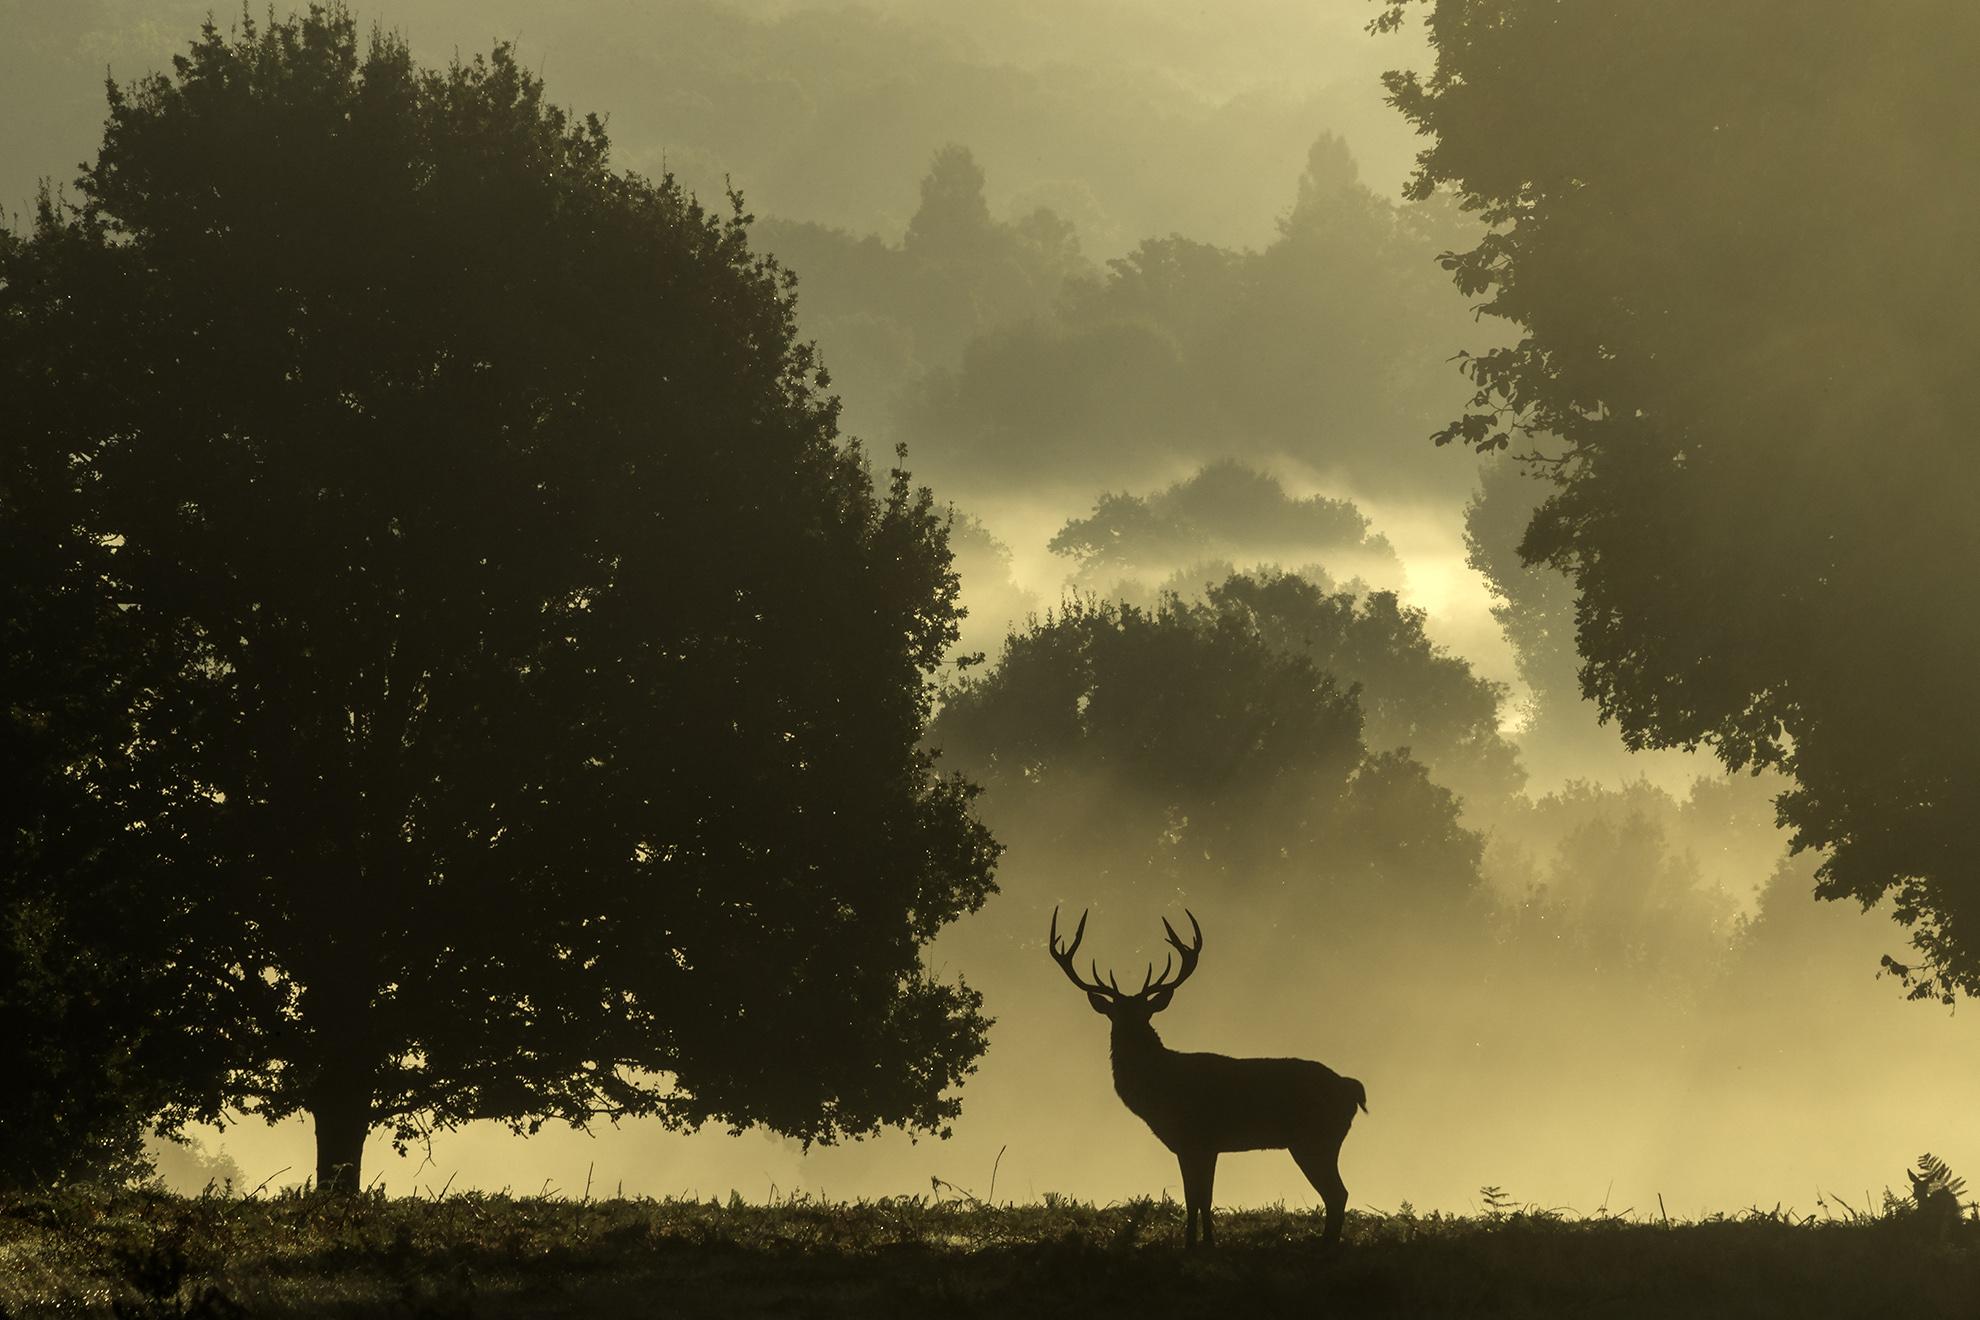 The king of beasts - Richmond Park - Andrew Wilson.jpg